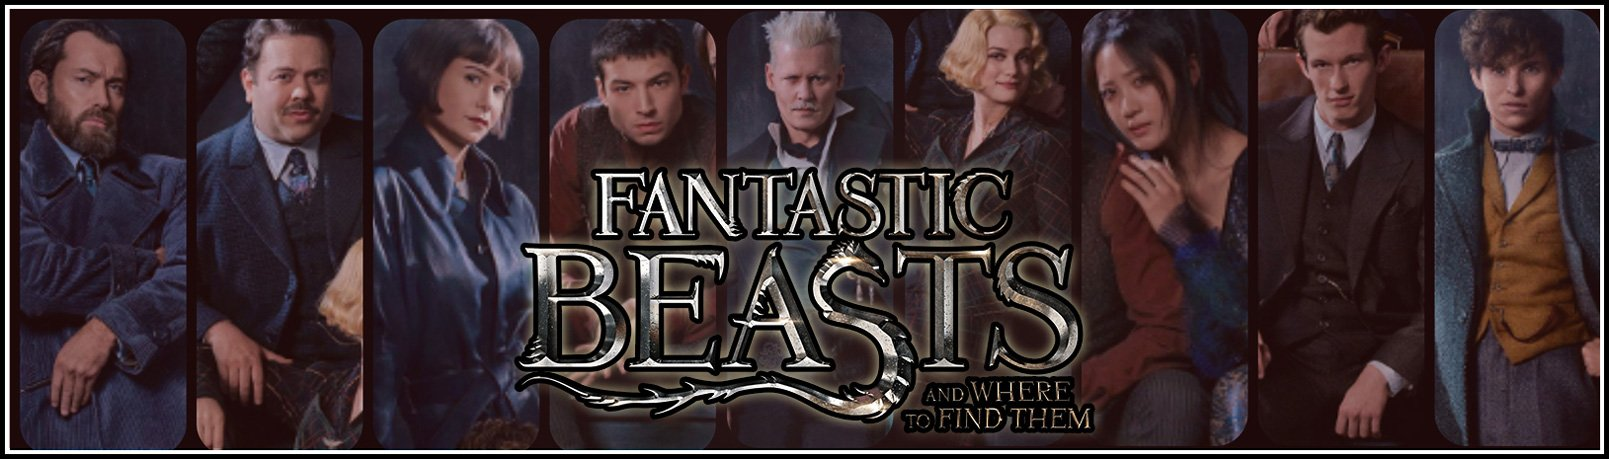 fantastic beasts jackets